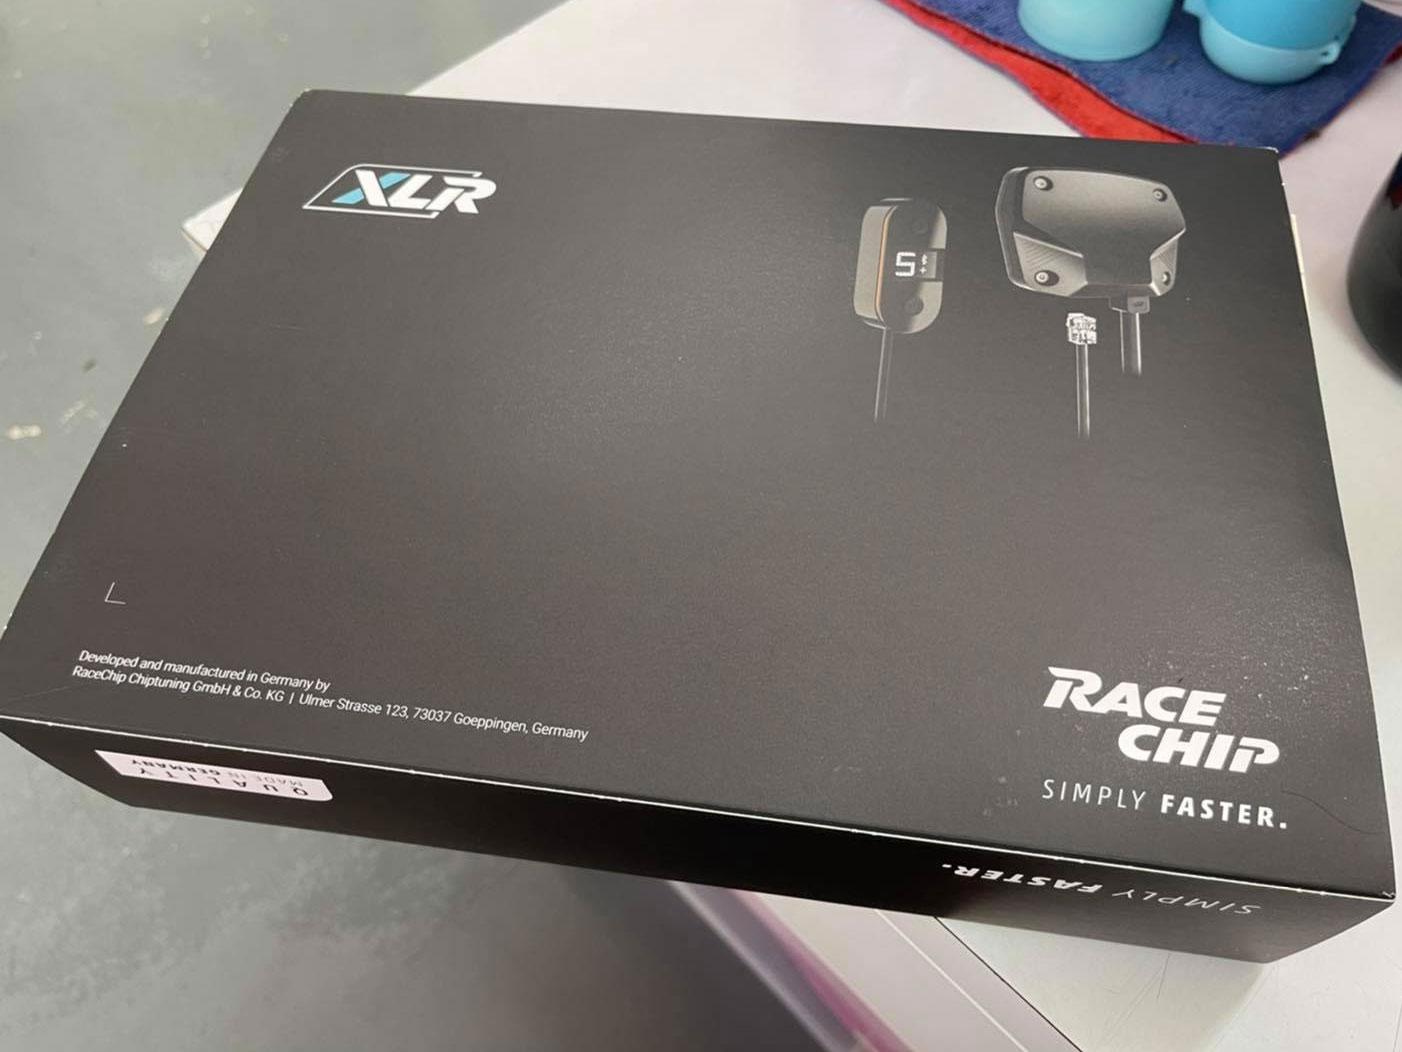 RaceChip XLR